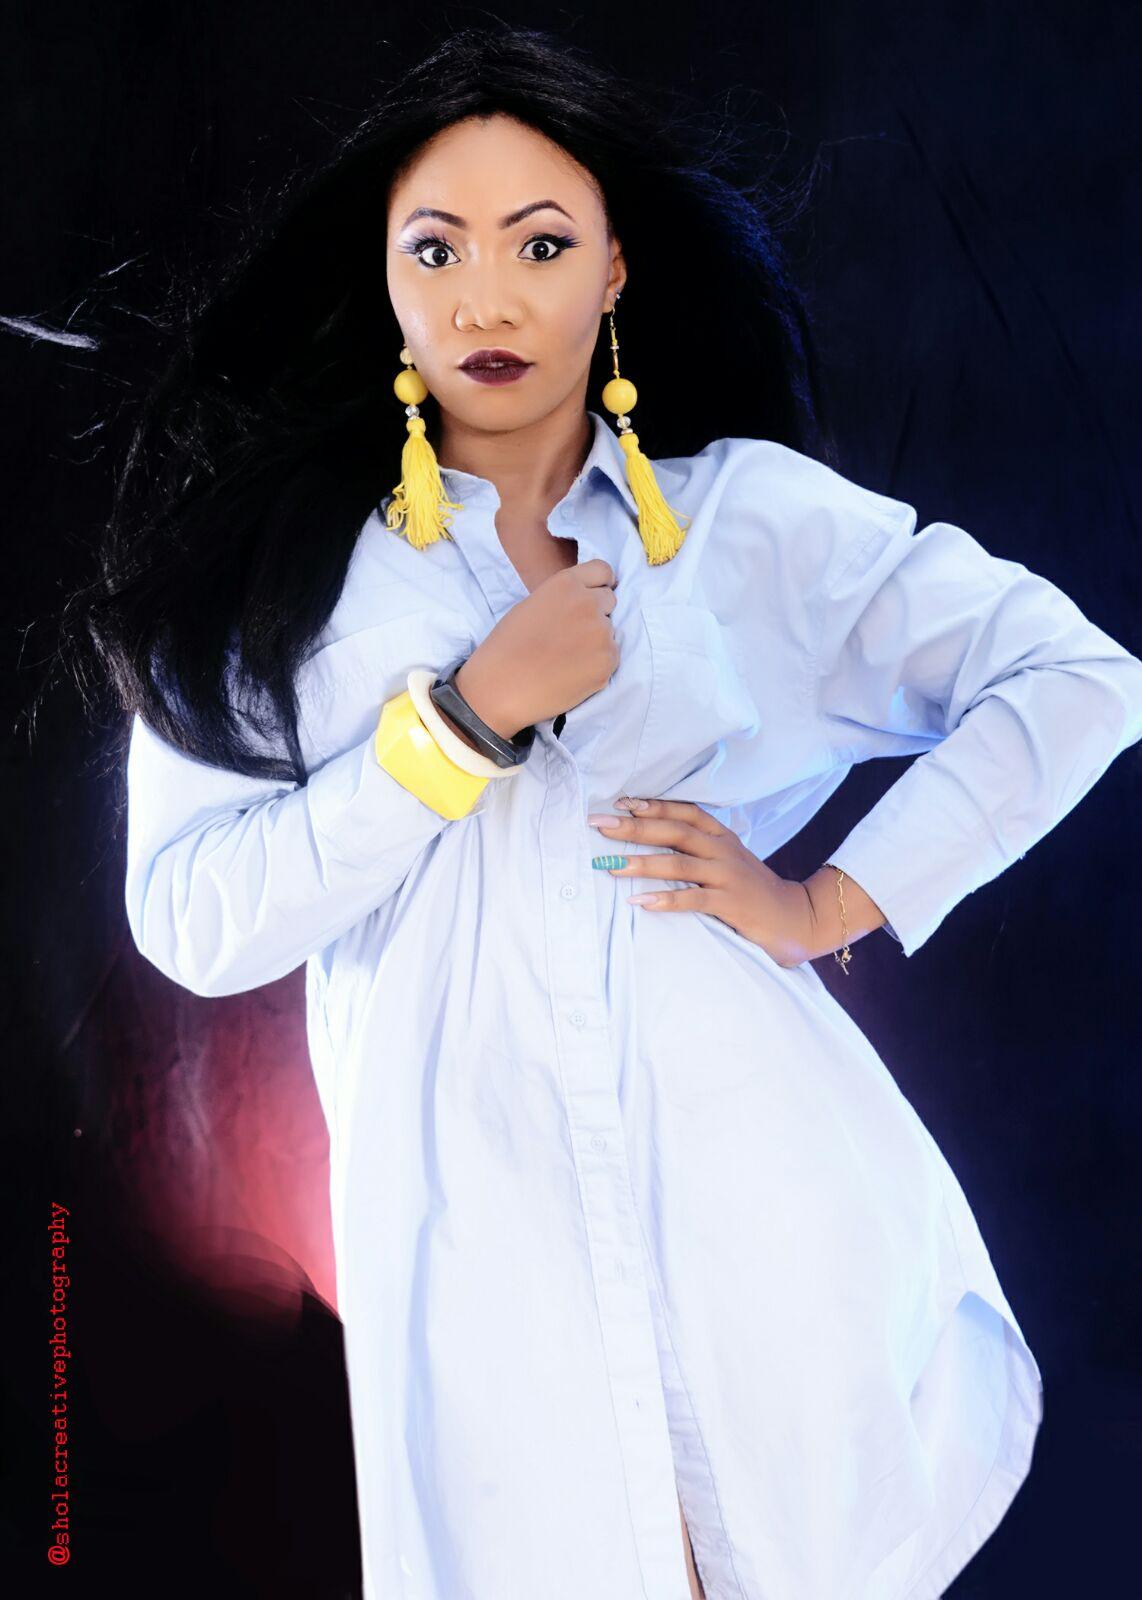 Photos: Nollywood Actress Amaka Chukwujekwu Glows In